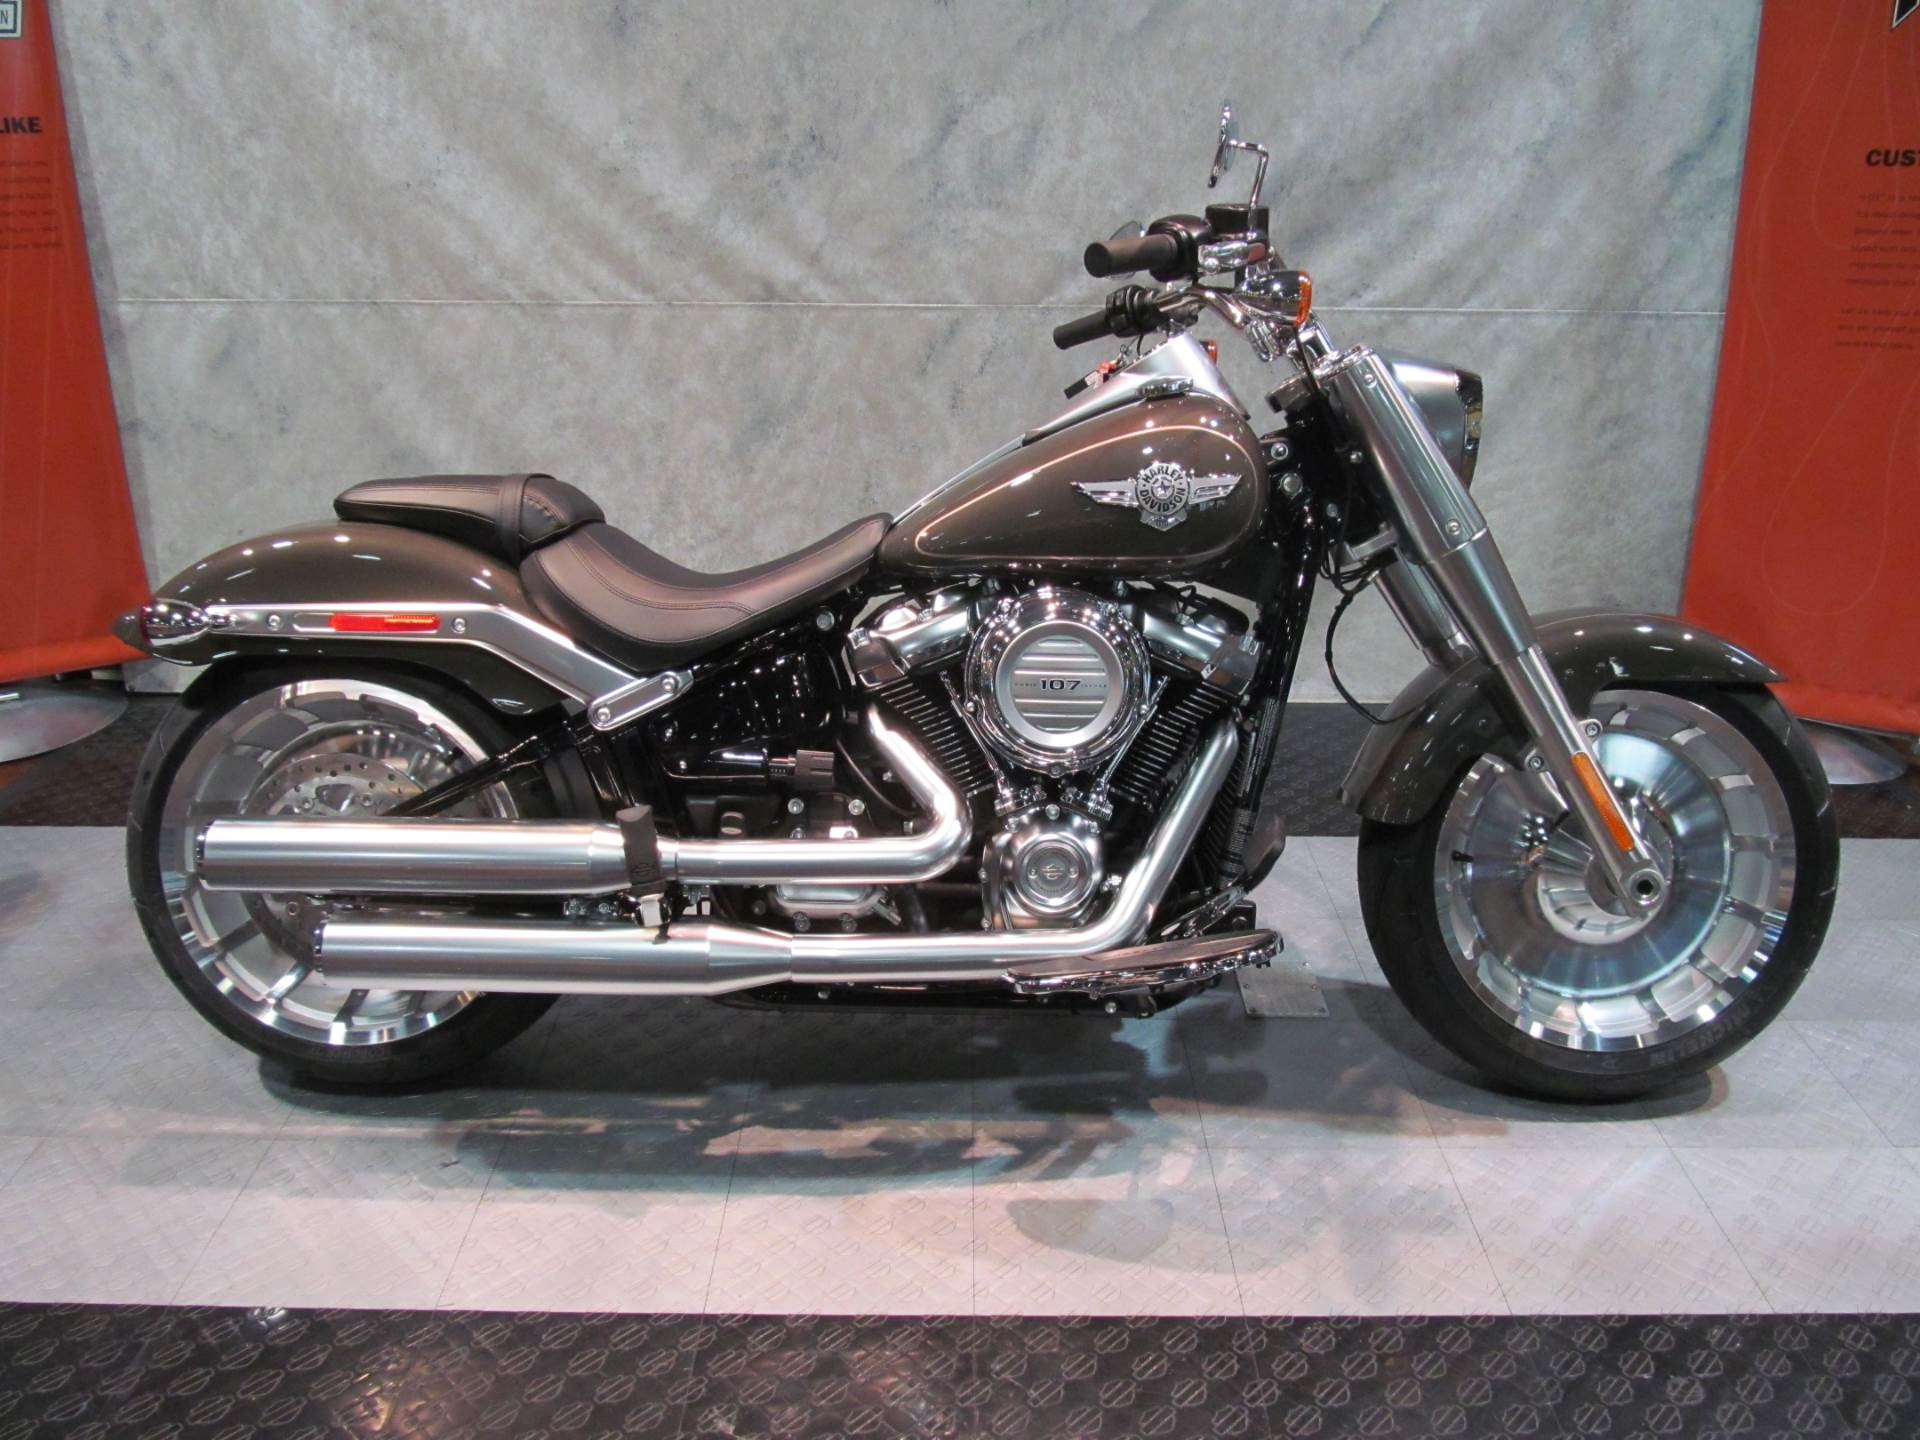 Motorcycles Harley Davidson Fat Boy 2018 Rothschild WI 471bed13 4f78 4823 9486 A81a00fce365